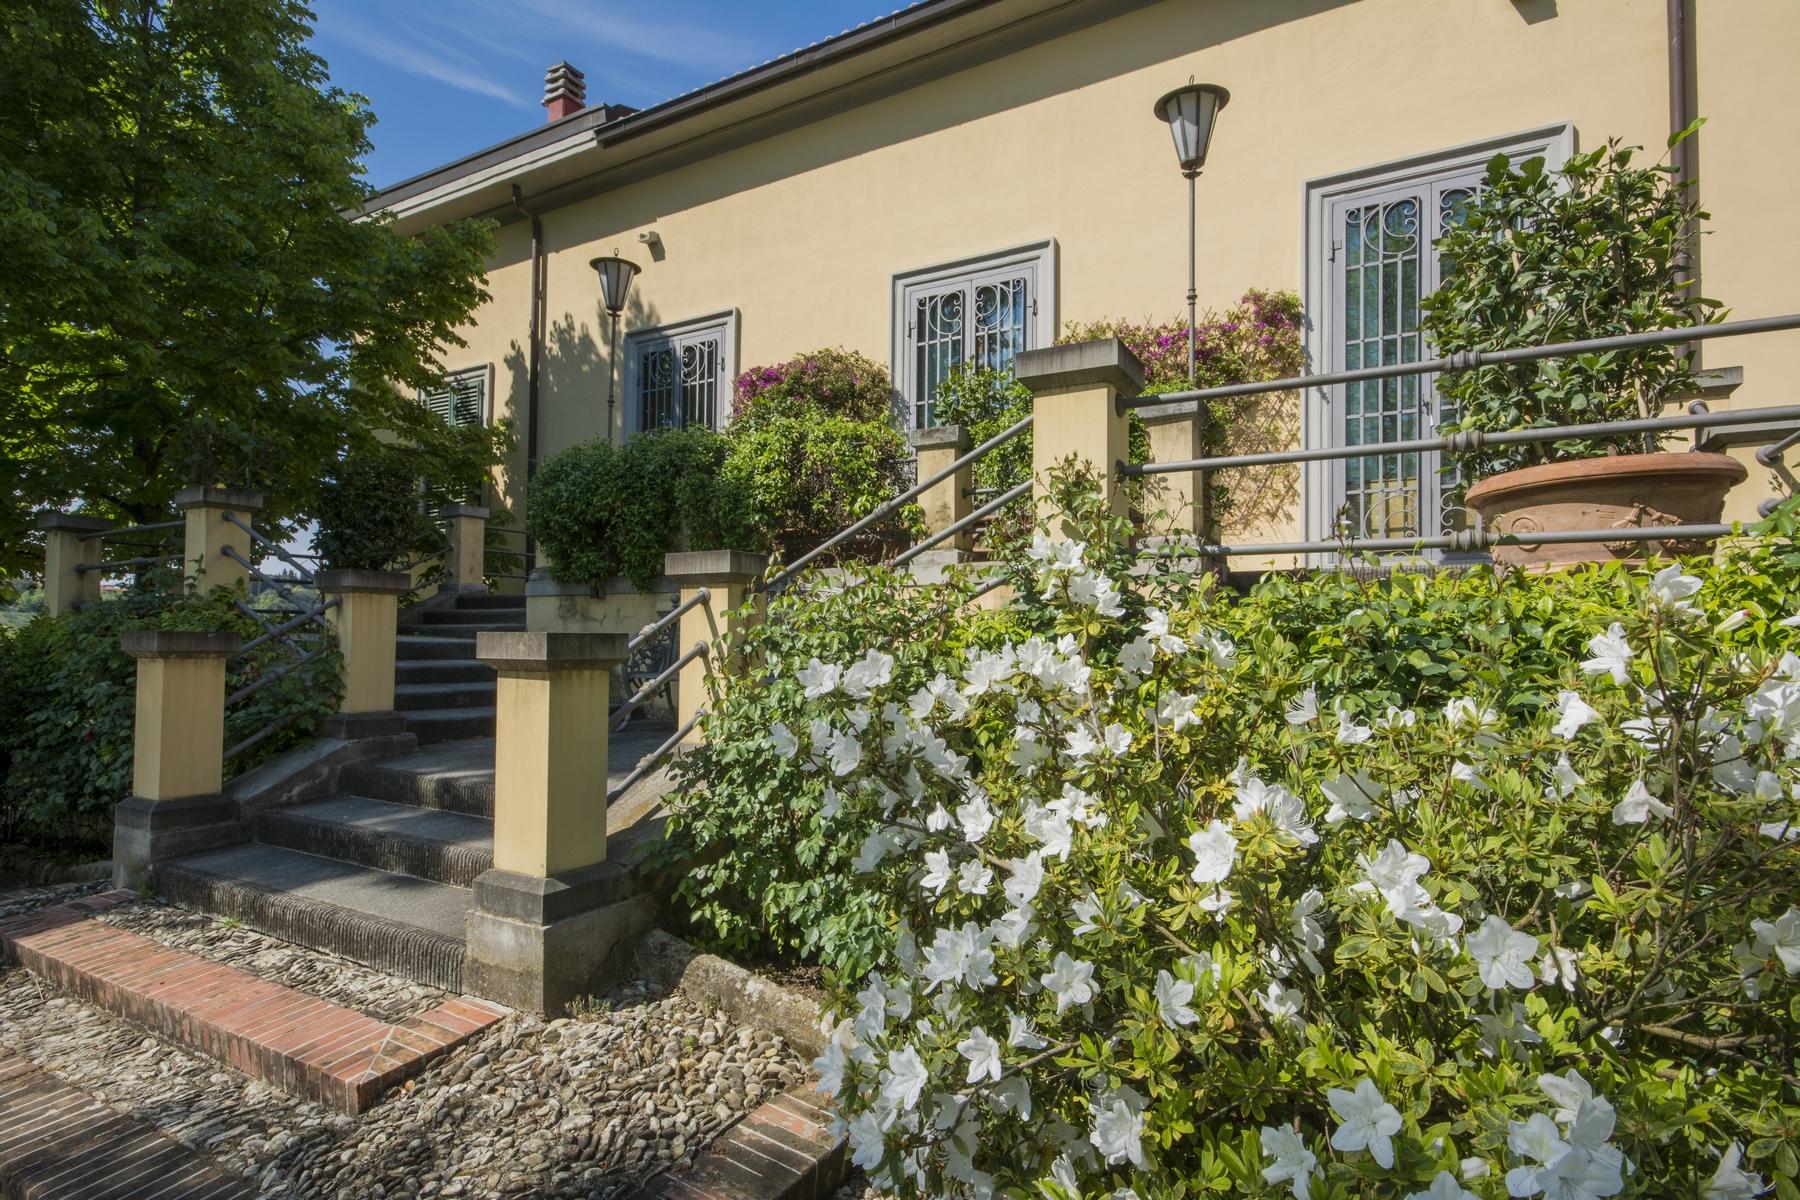 Casa indipendente in Vendita a Firenze Semicentro Est: 5 locali, 580 mq